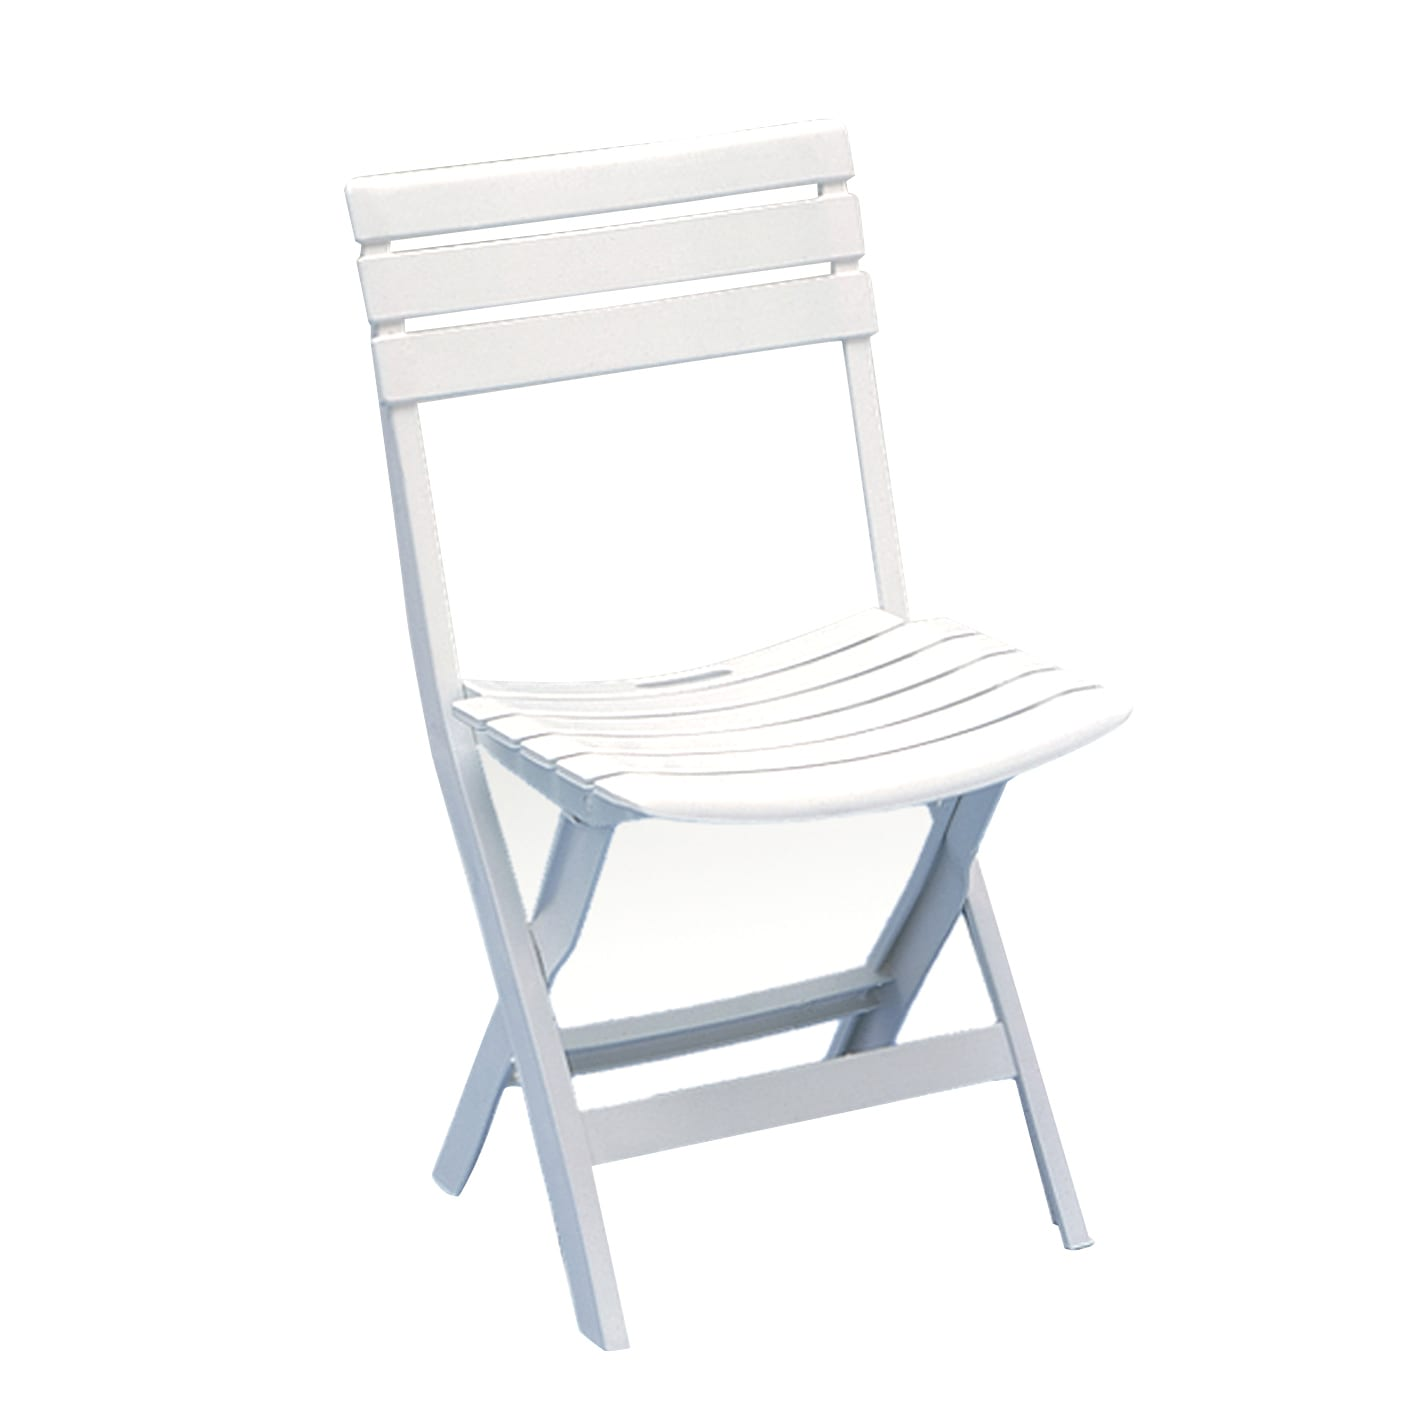 Sedie Bianche In Offerta.Sedia In Polipropilene Birki Colore Bianco Prezzi E Offerte Online